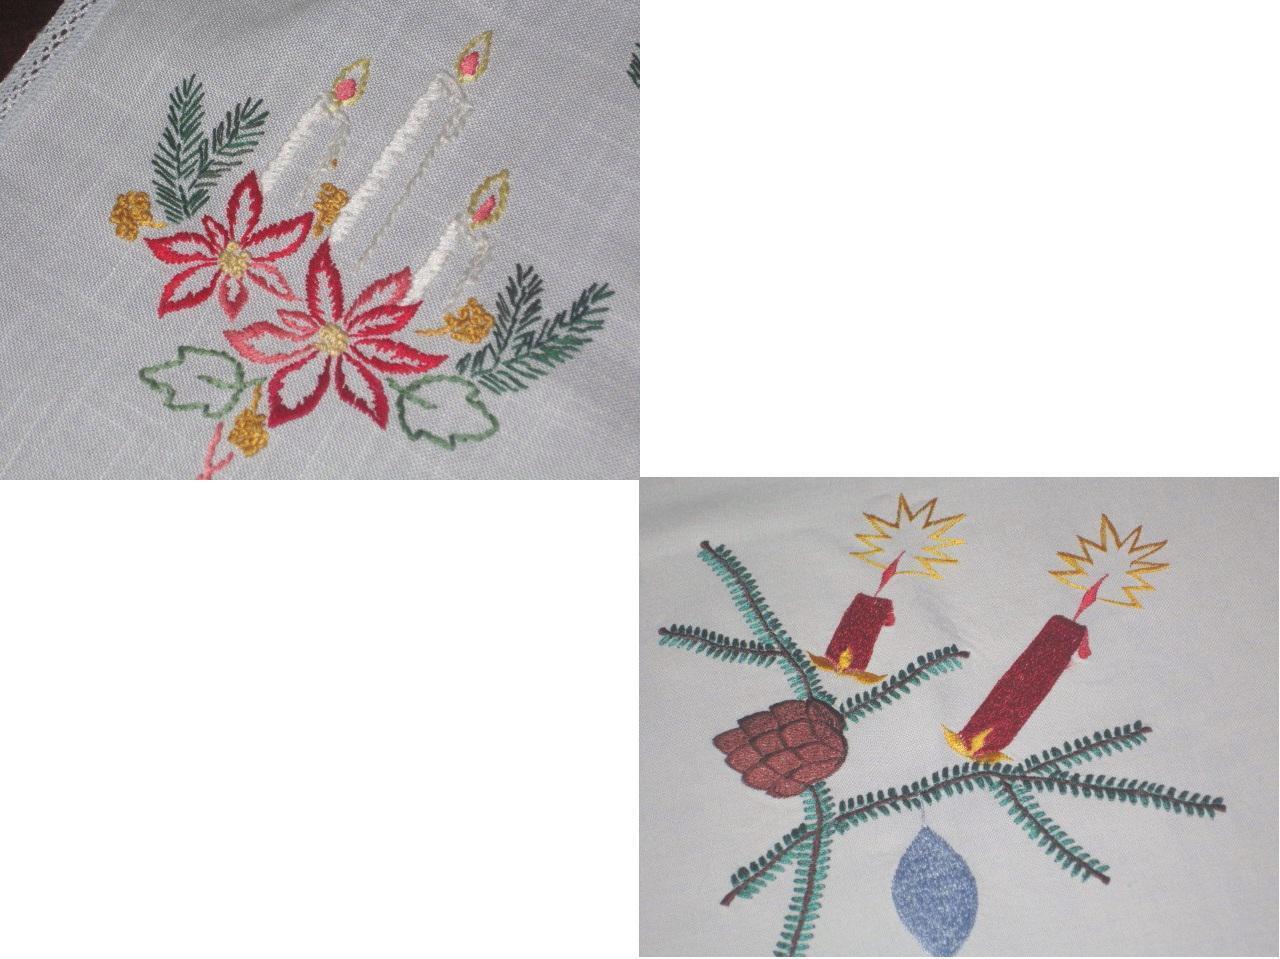 CHRISTMAS GLOW  VTG GERMAN LARGE TABLECLOTH + POINSETTIAS & rose RIBBONS RUNNER